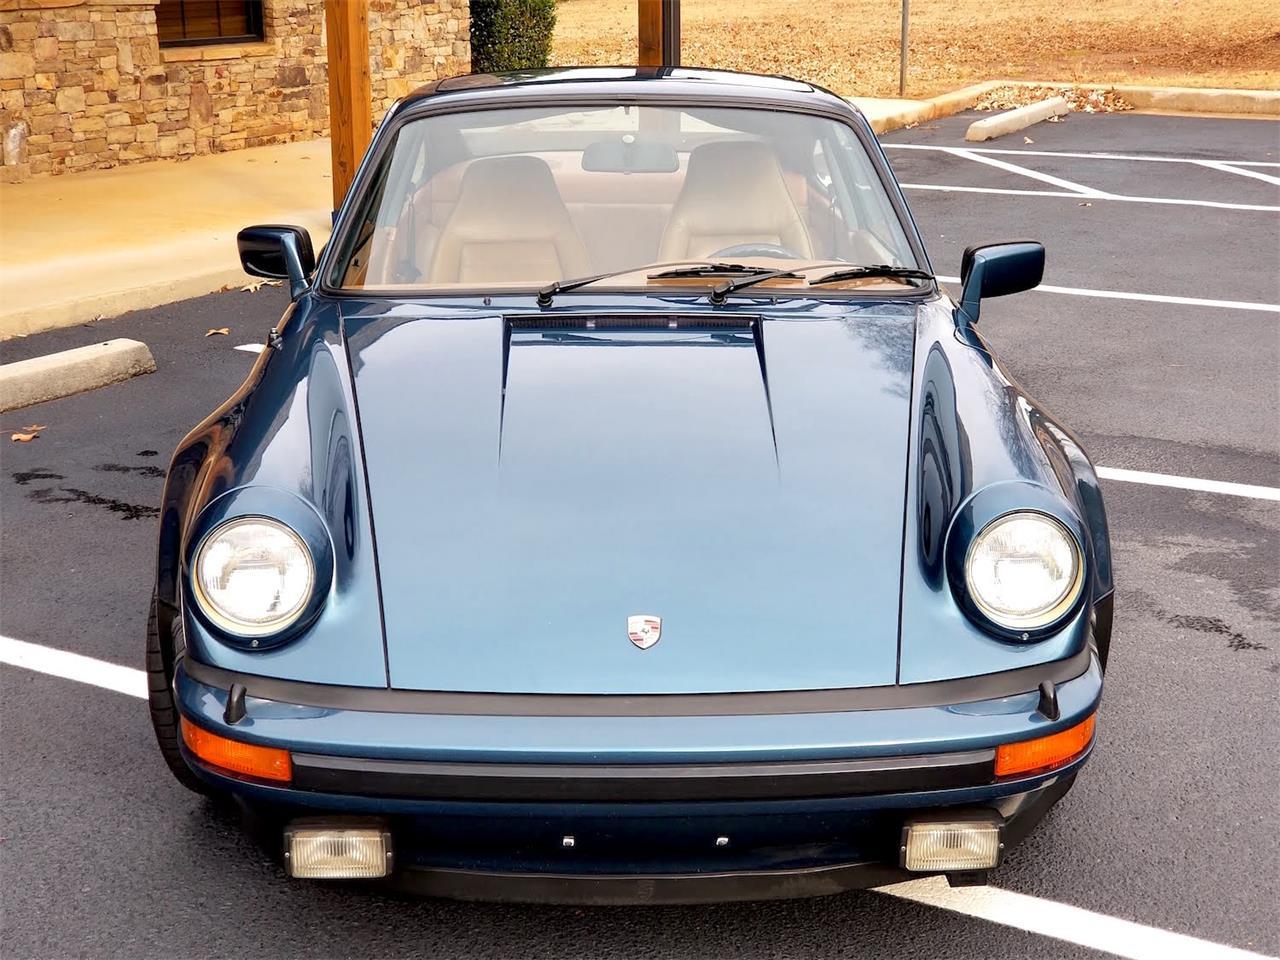 1979 Porsche 911 Carrera Turbo (CC-1304520) for sale in Oakwood, Georgia